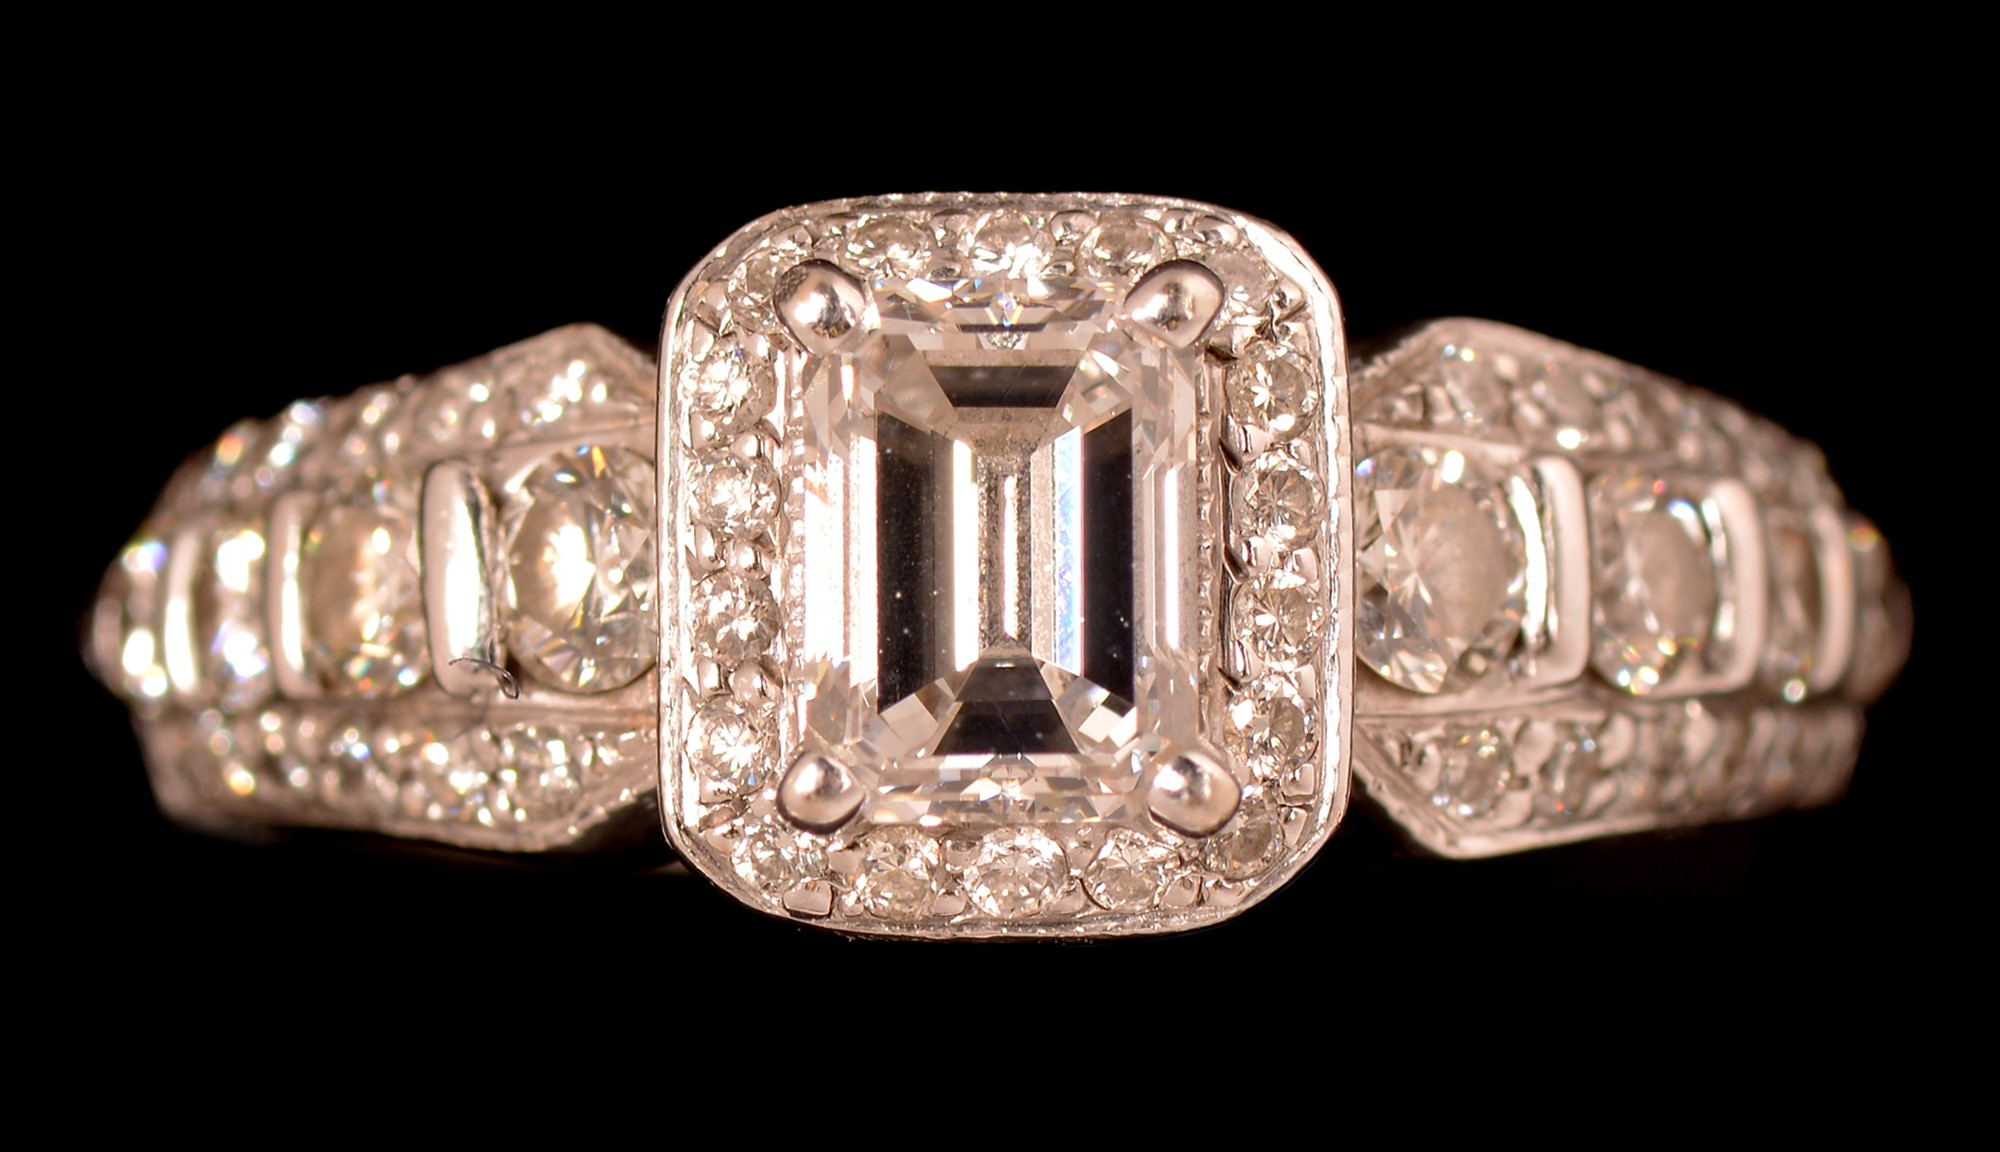 Lot 517 - Diamond cluster ring